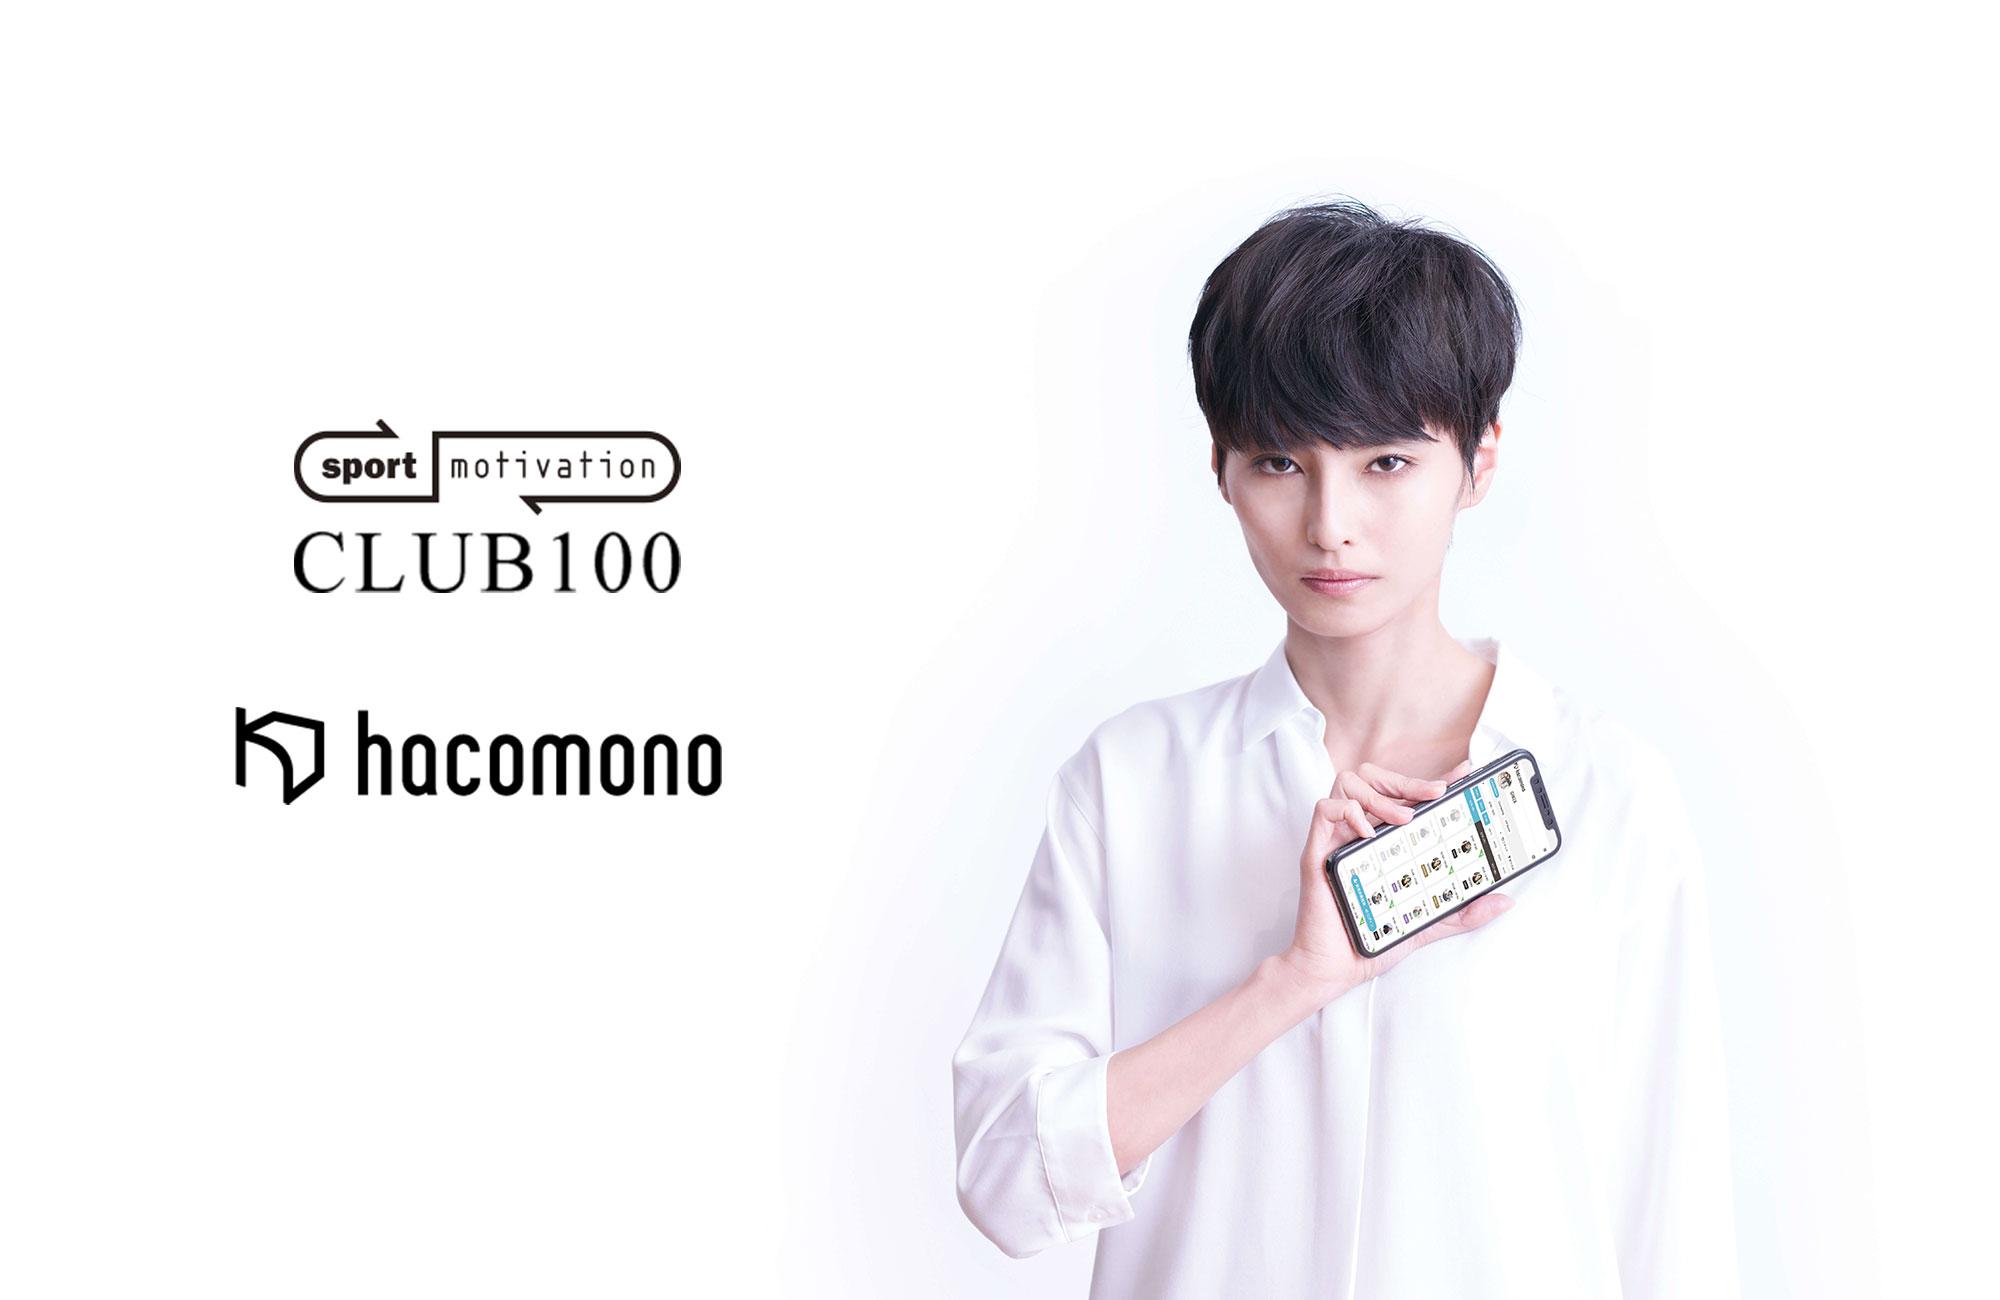 【IT業界初】hacomonoにコンディショニングトレーナーとして青学駅伝チームフィジカルコーチ「中... 画像